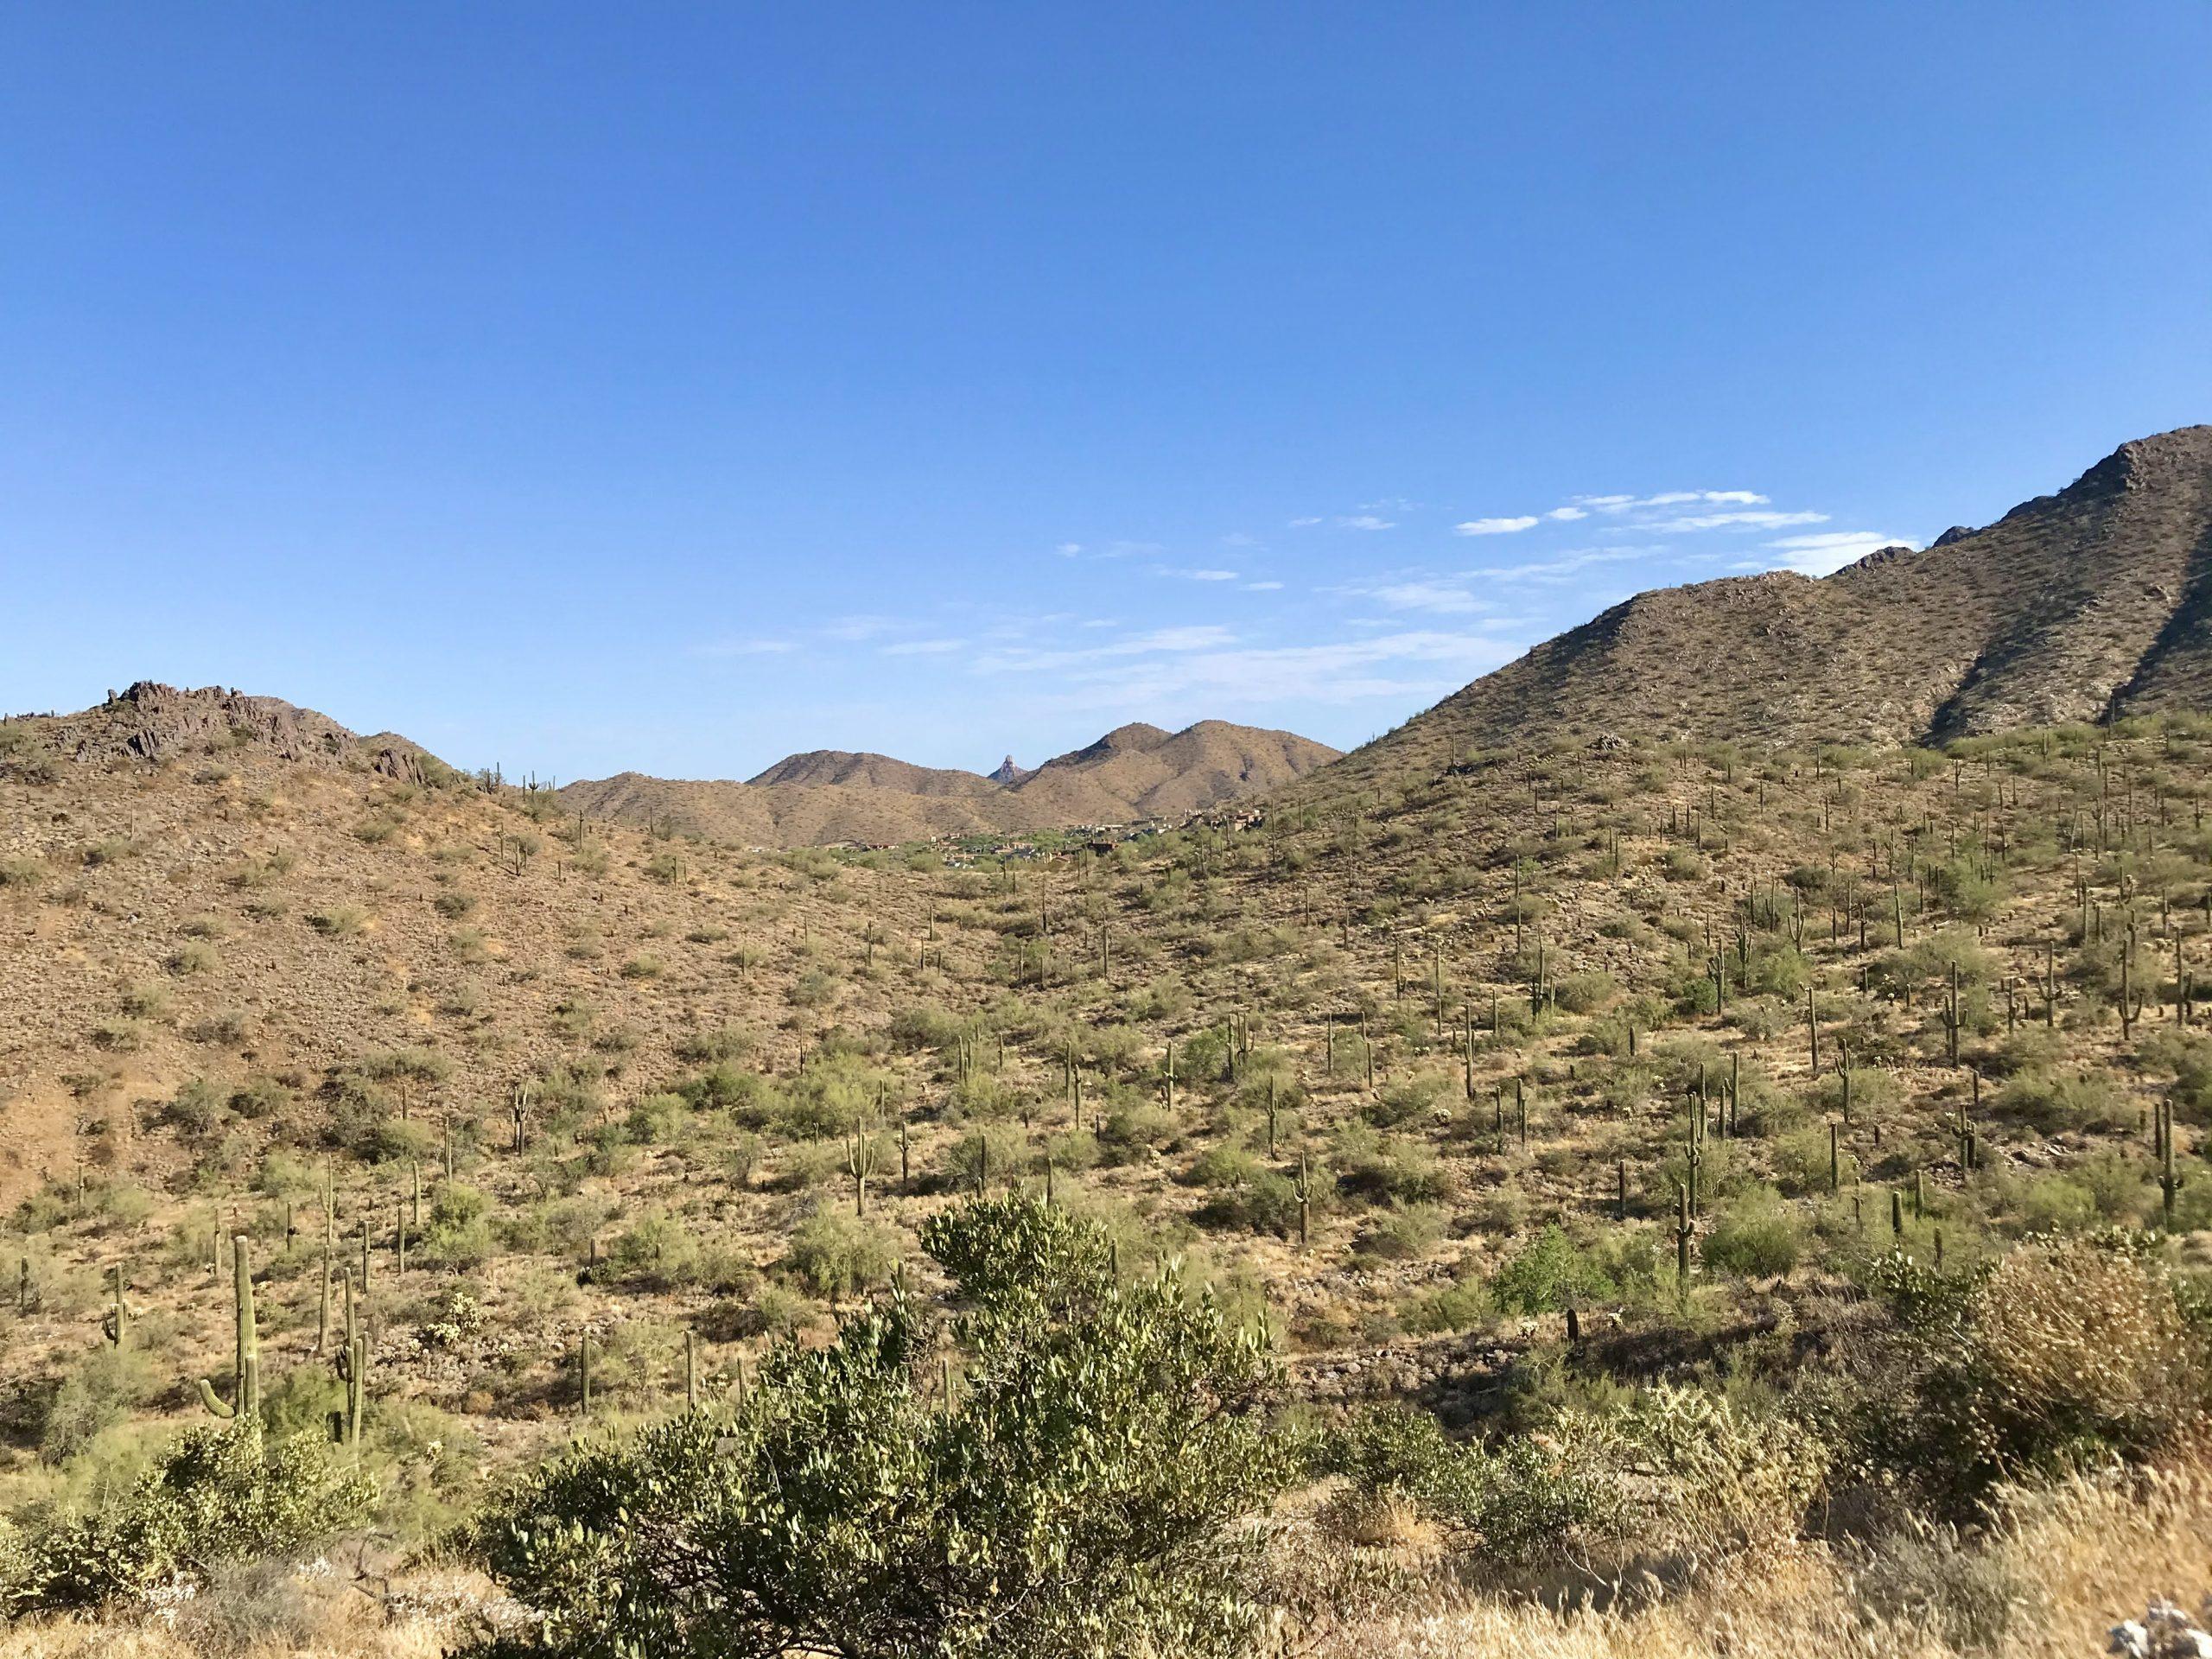 Inspiration Point Hike McDowell Sonoran Preserve Pinnacle Peak